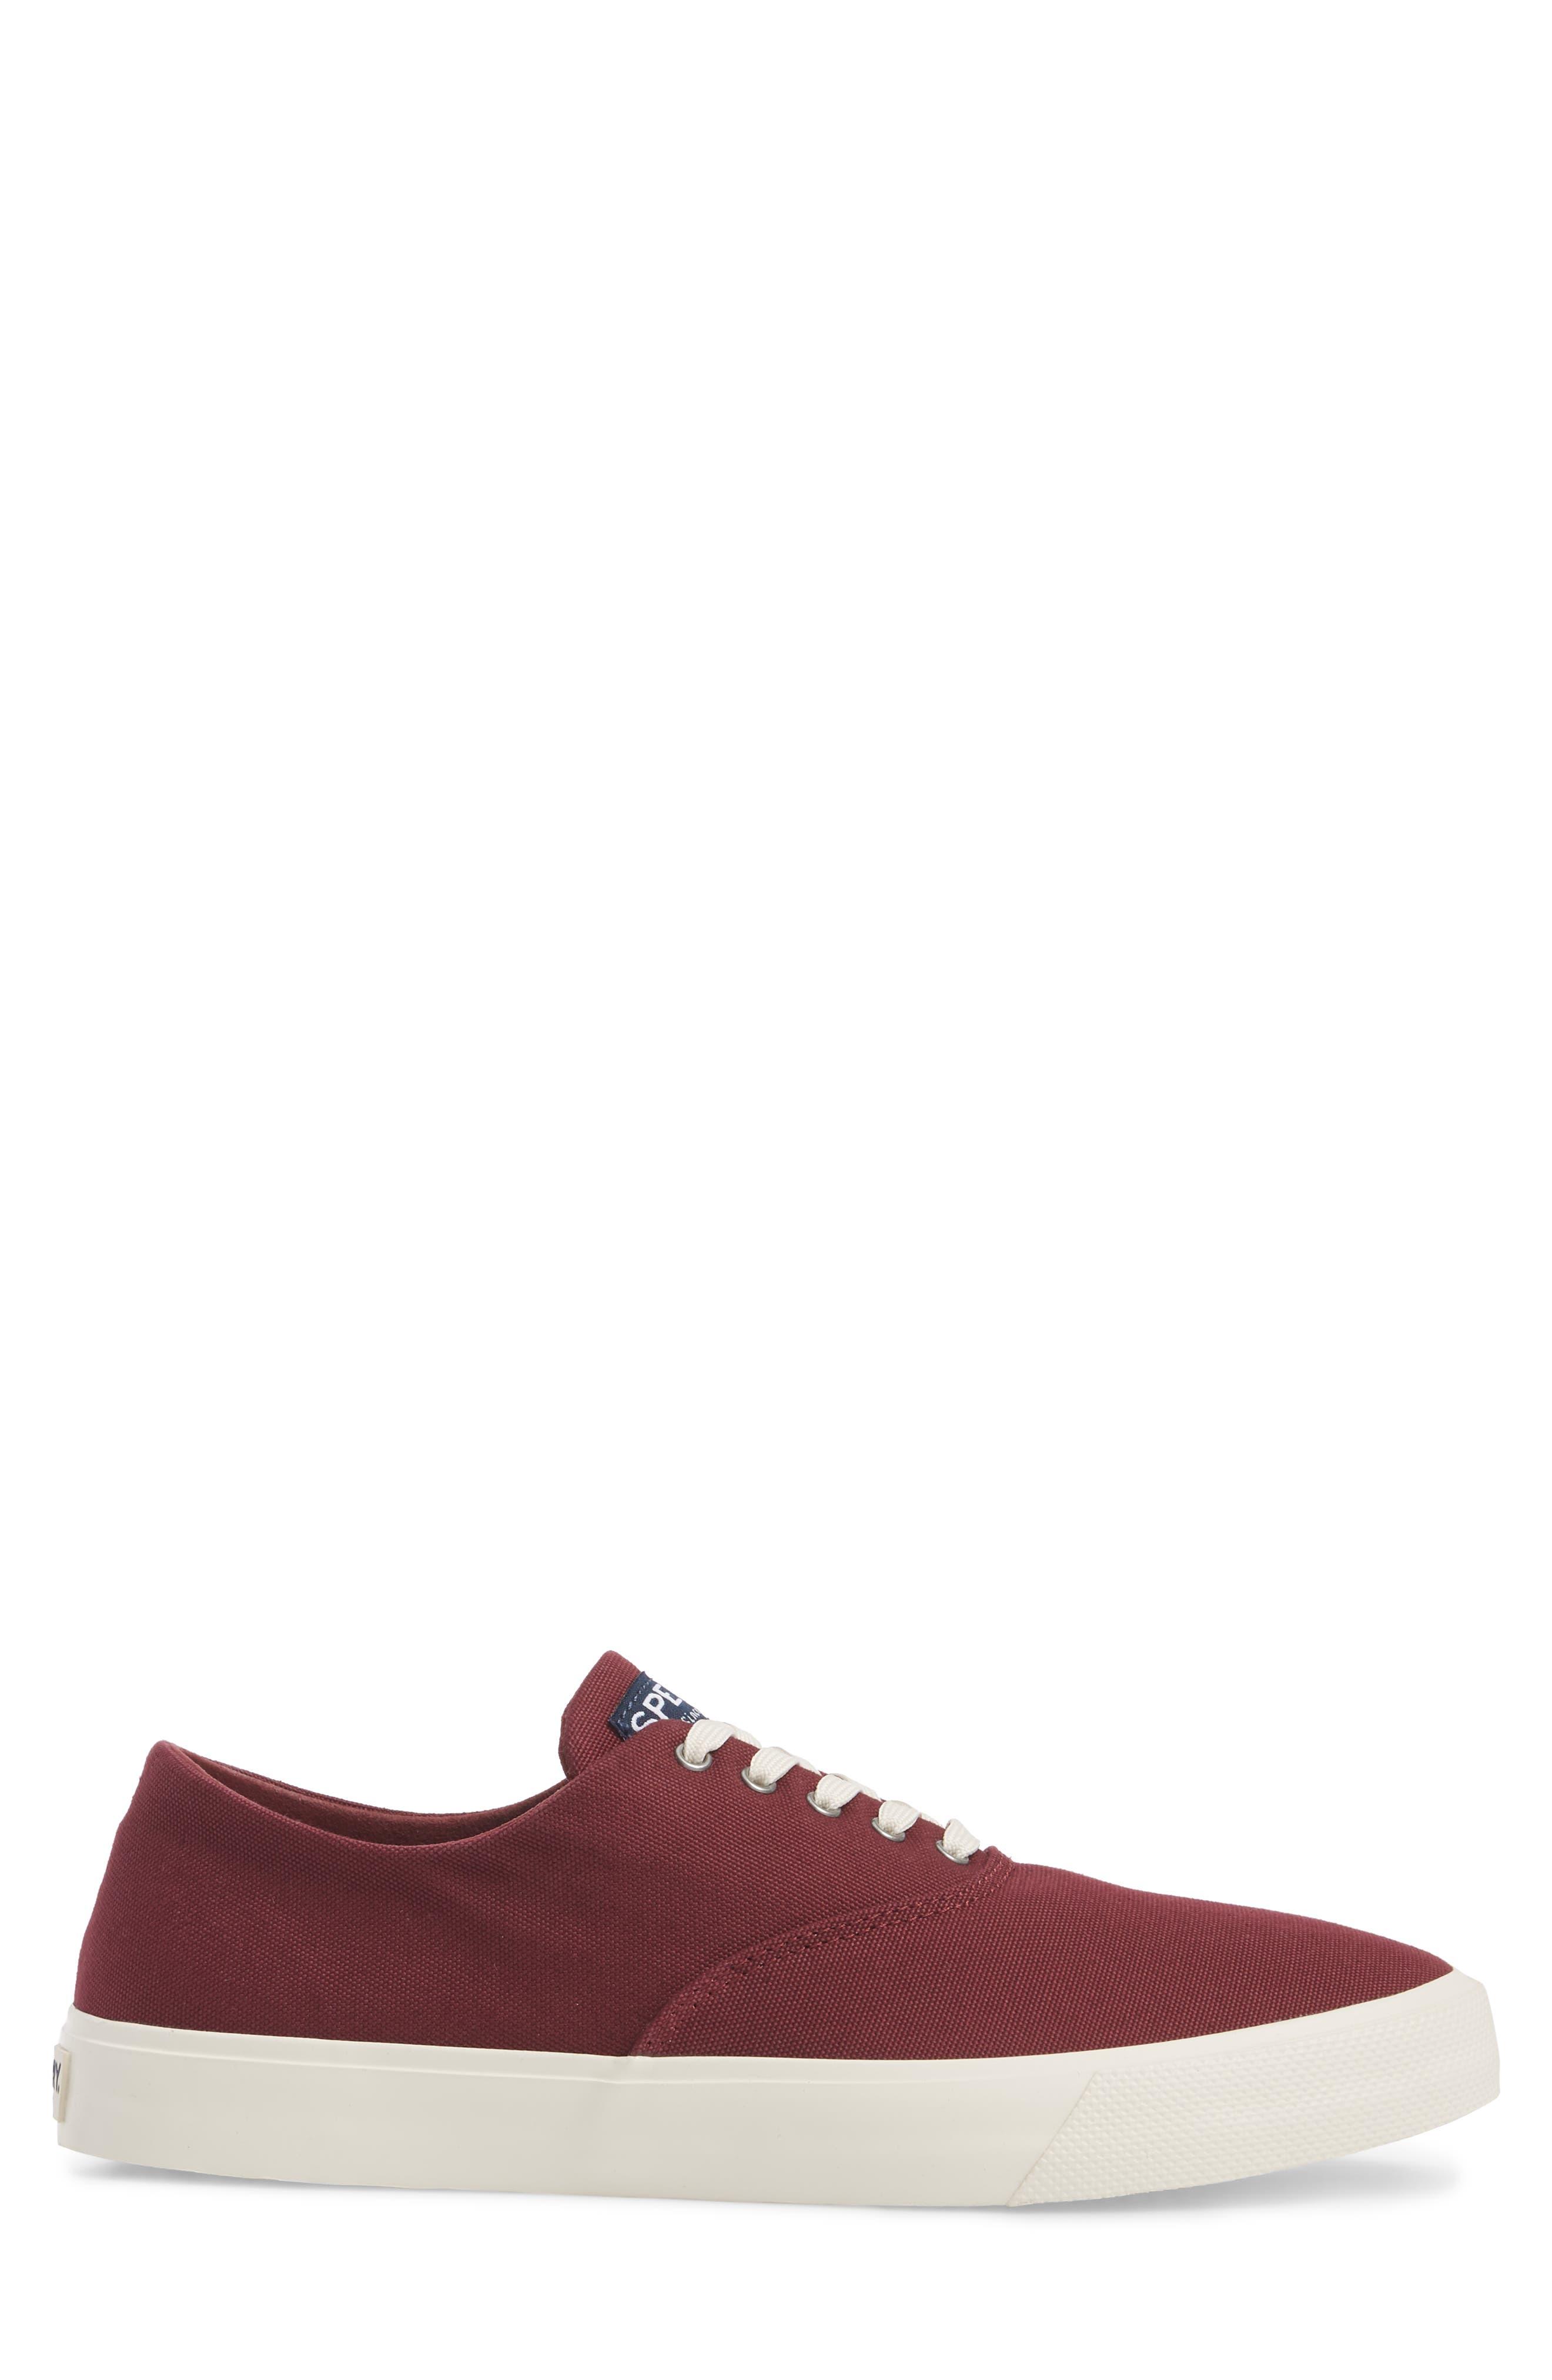 Captain's CVO Sneaker,                             Alternate thumbnail 3, color,                             WINE FABRIC